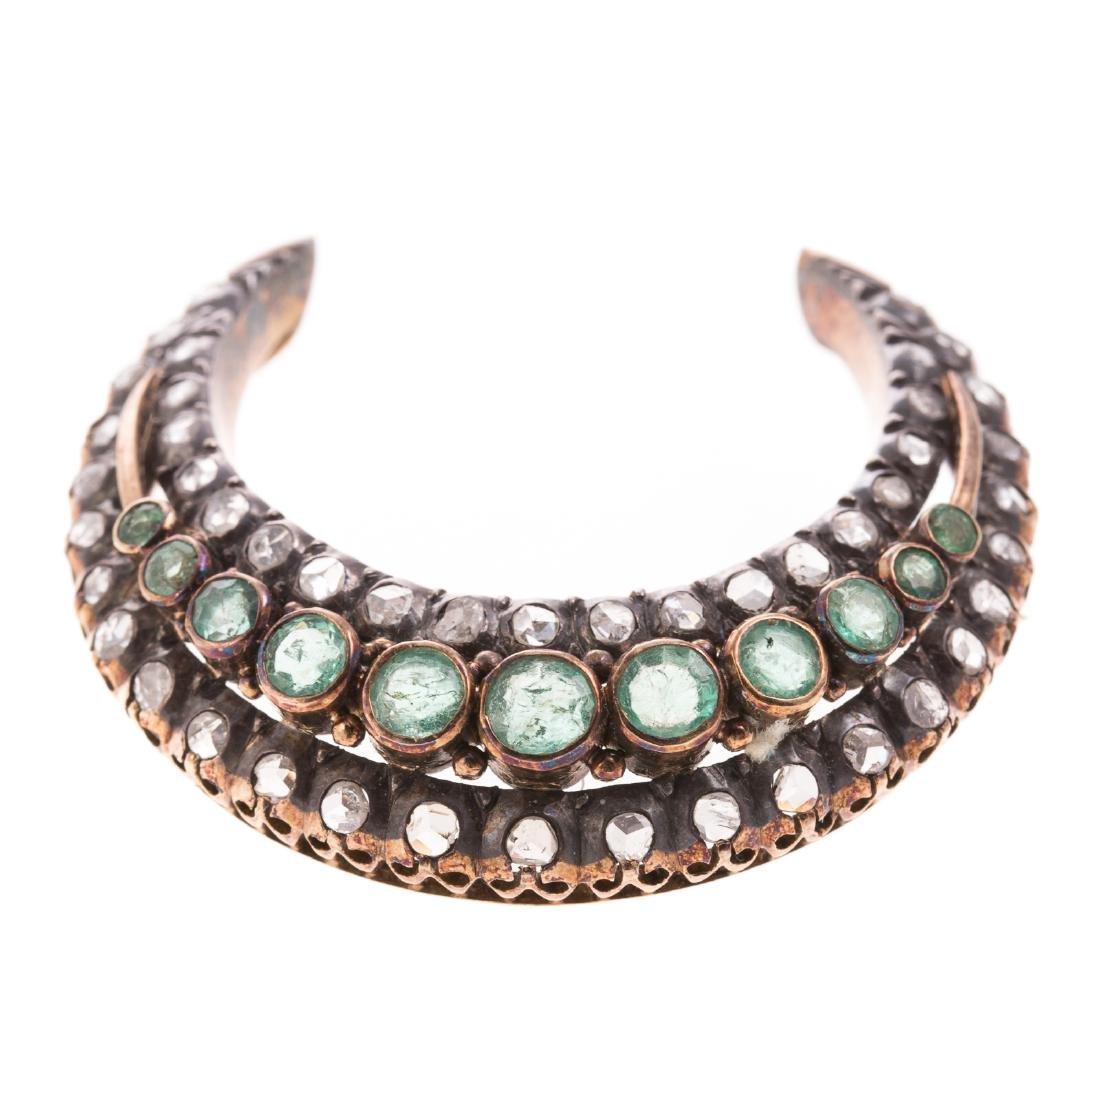 An Edwardian Emerald & Diamond Crescent Moon Pin - 4